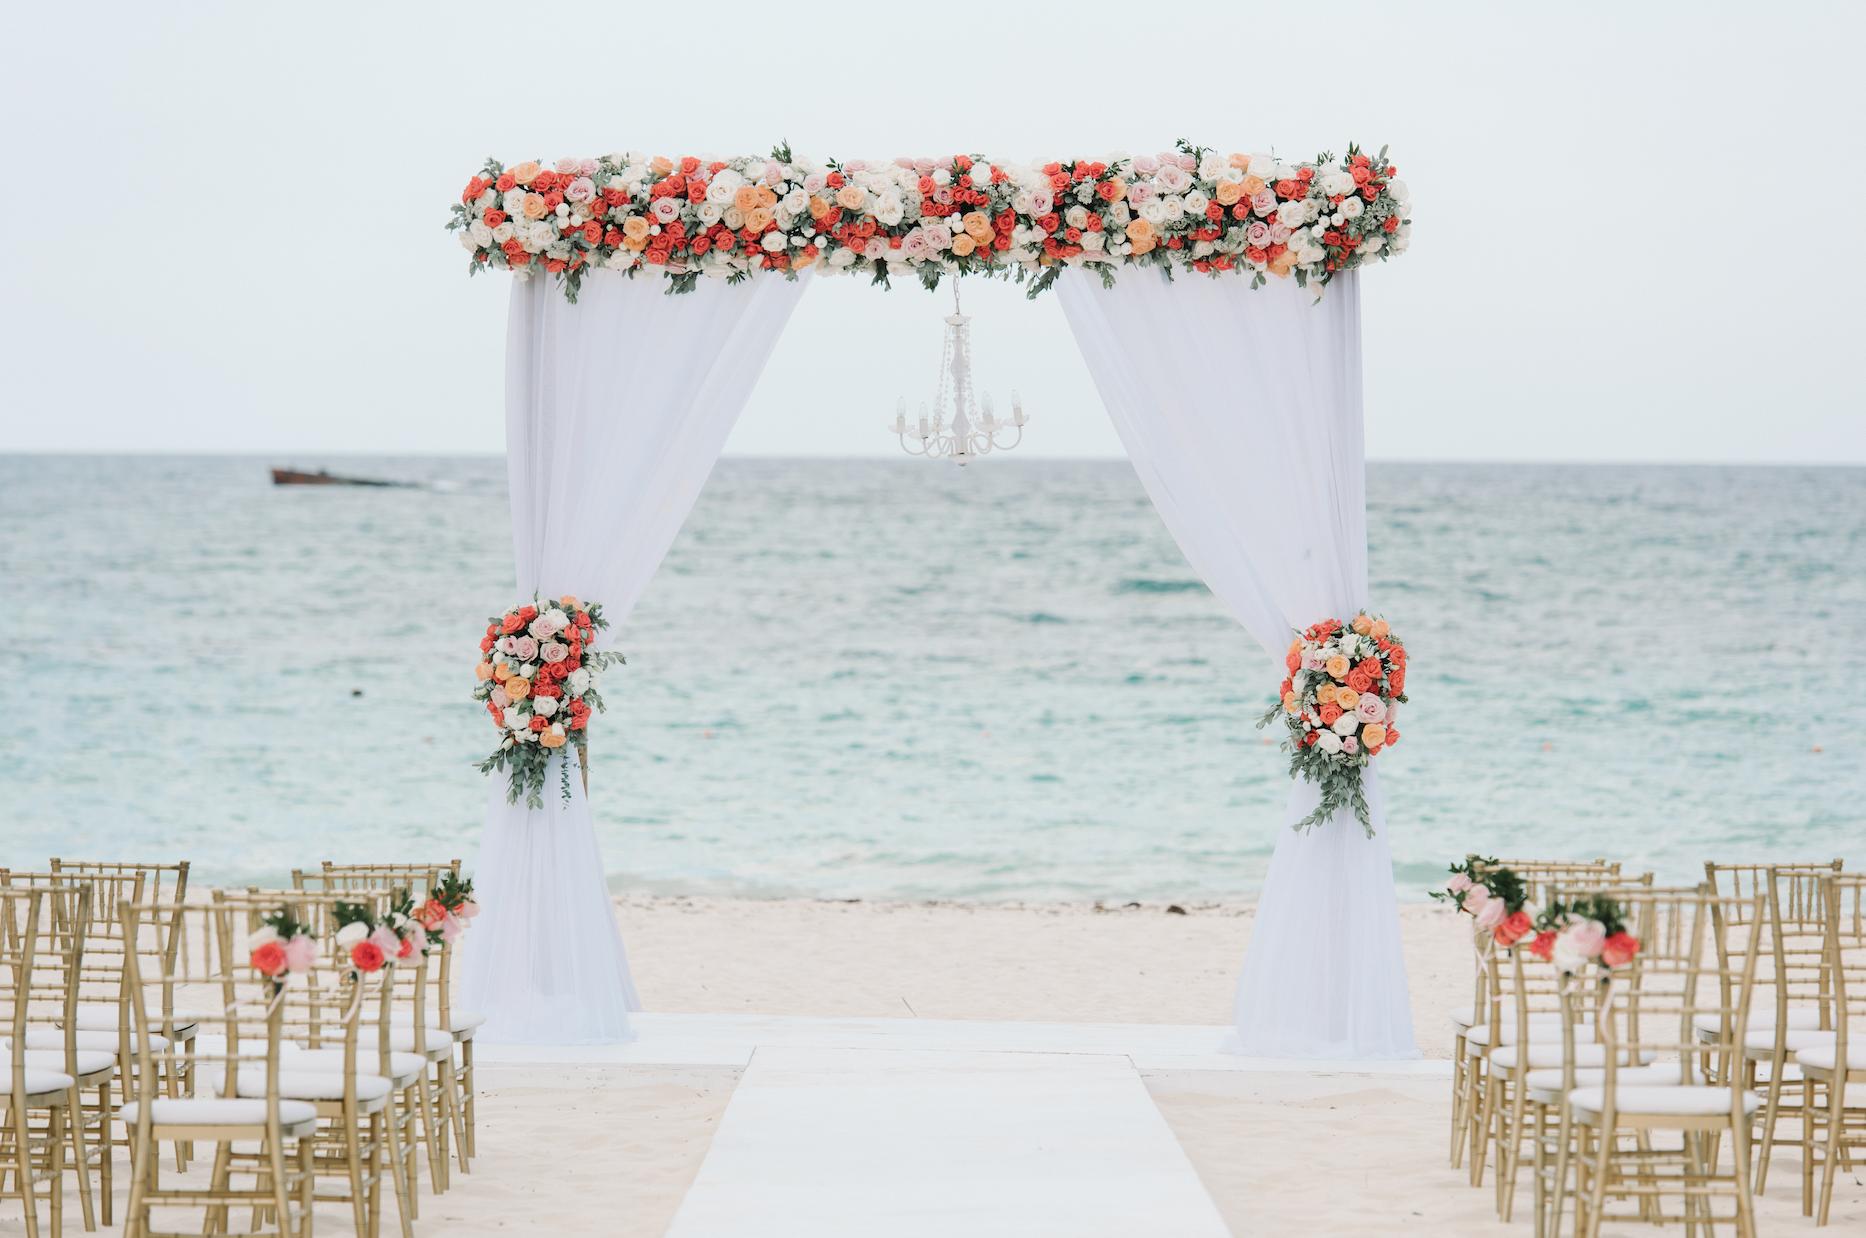 Set Against The Blue Sea This Beach Wedding Gazebo Is Totally